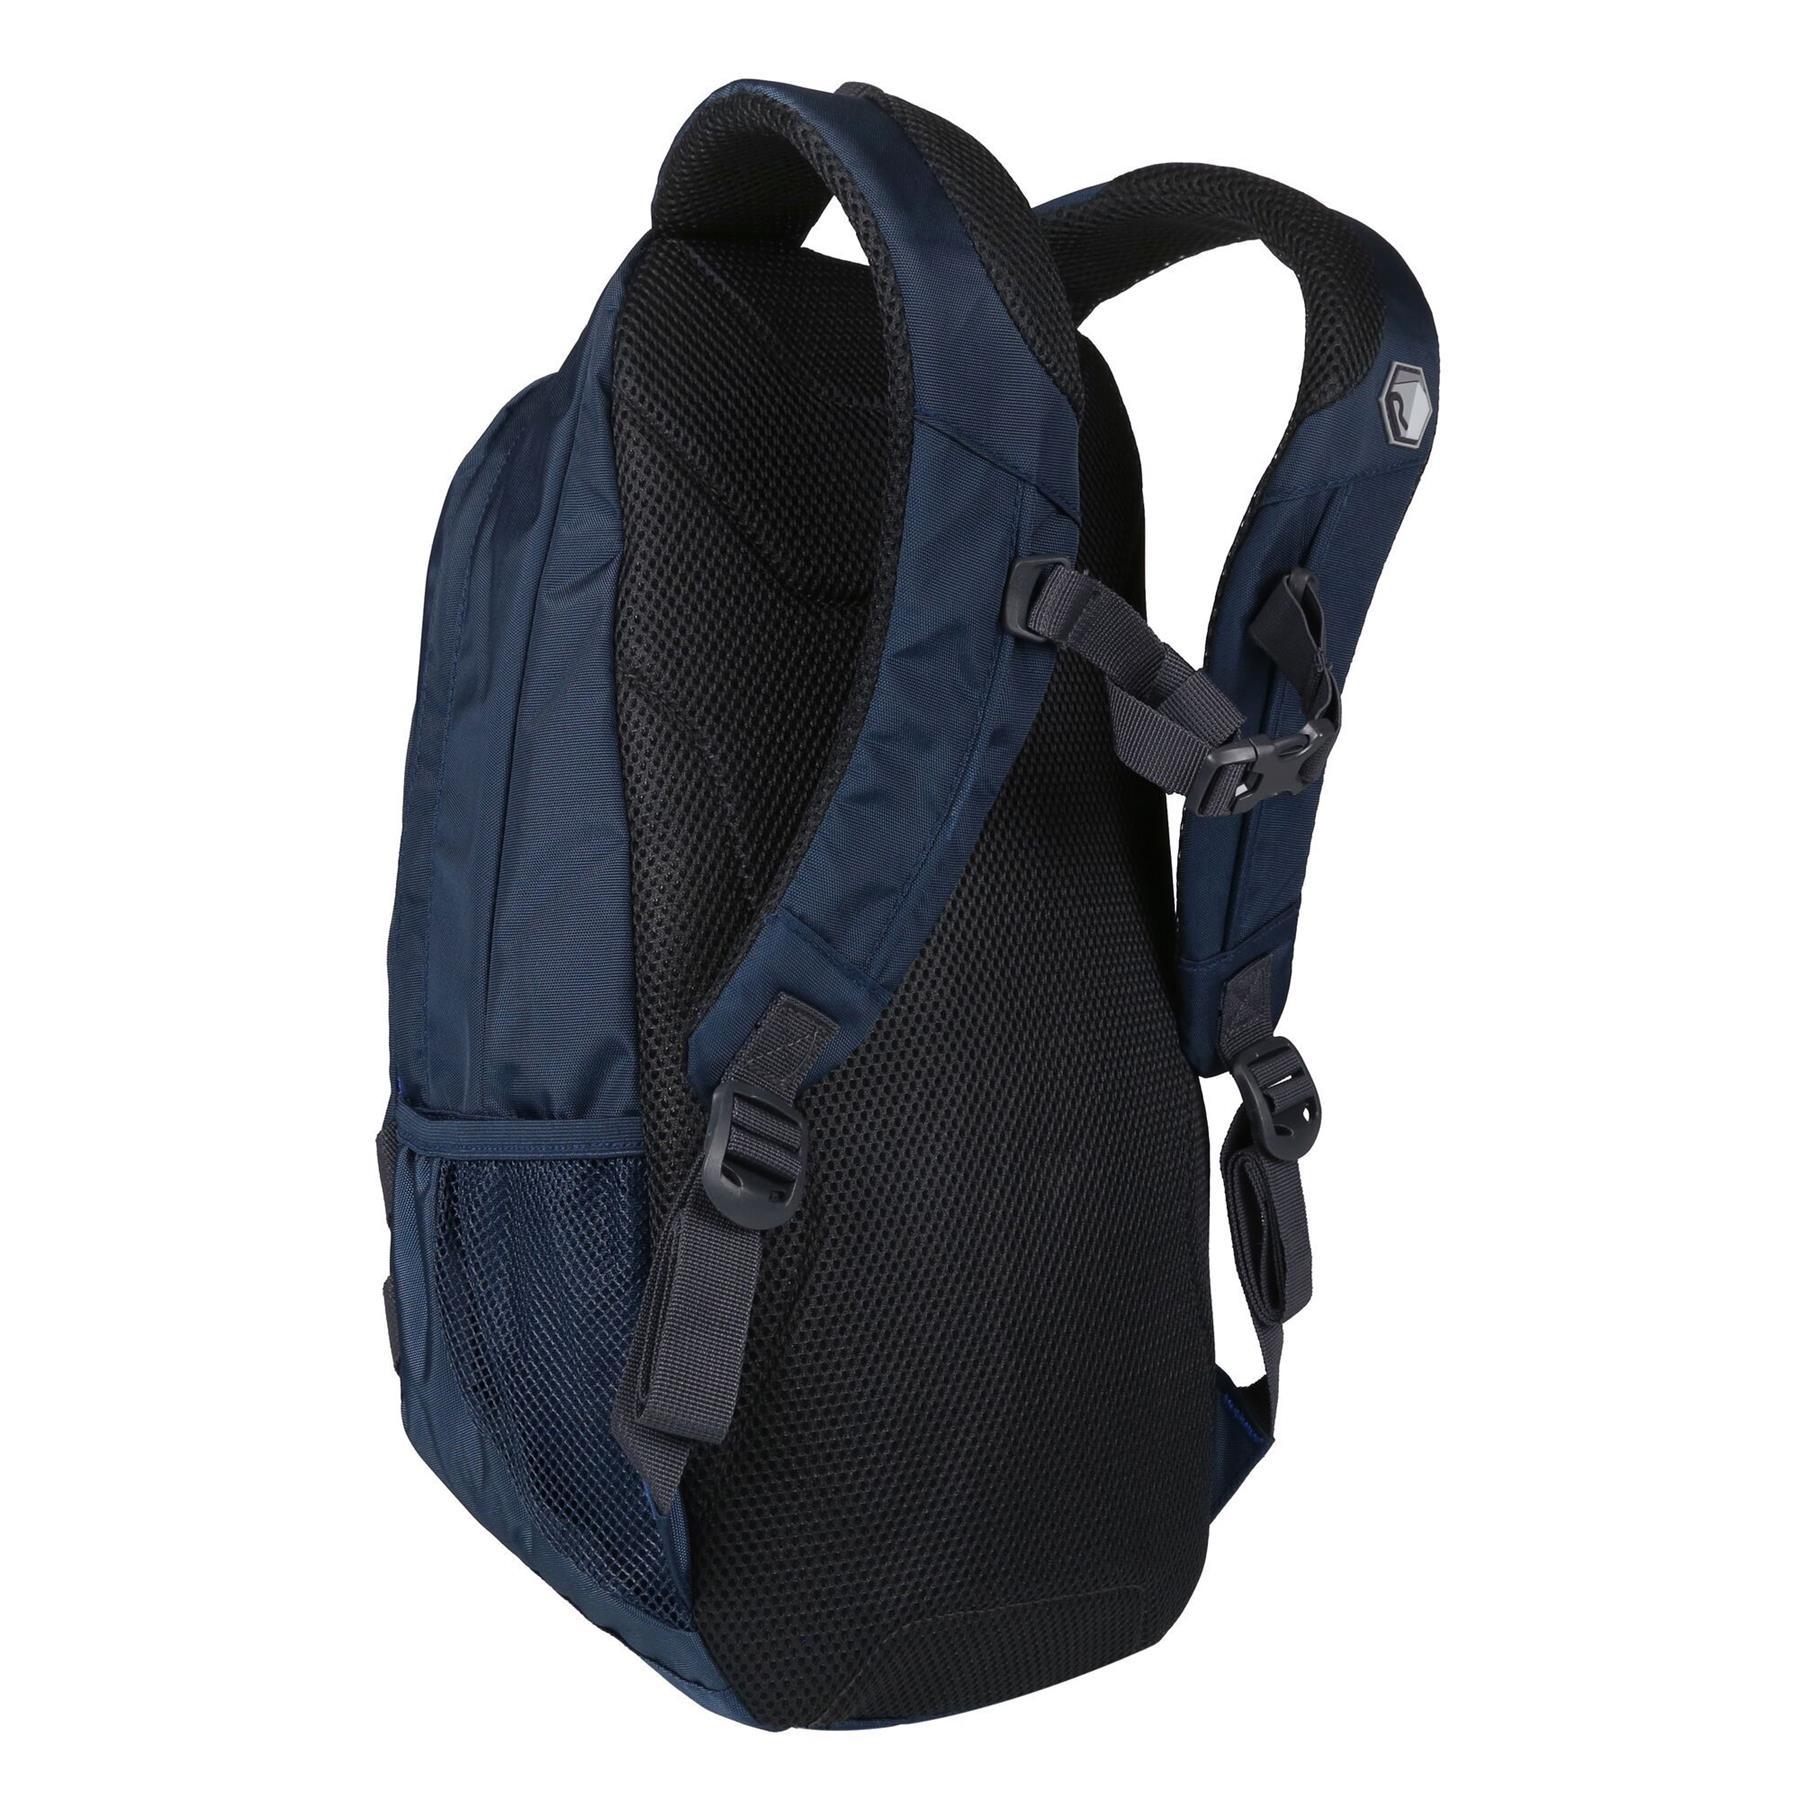 Regatta Brize II 20L Litre Rucksack Backpack Walking Mens Womens Unisex Bag